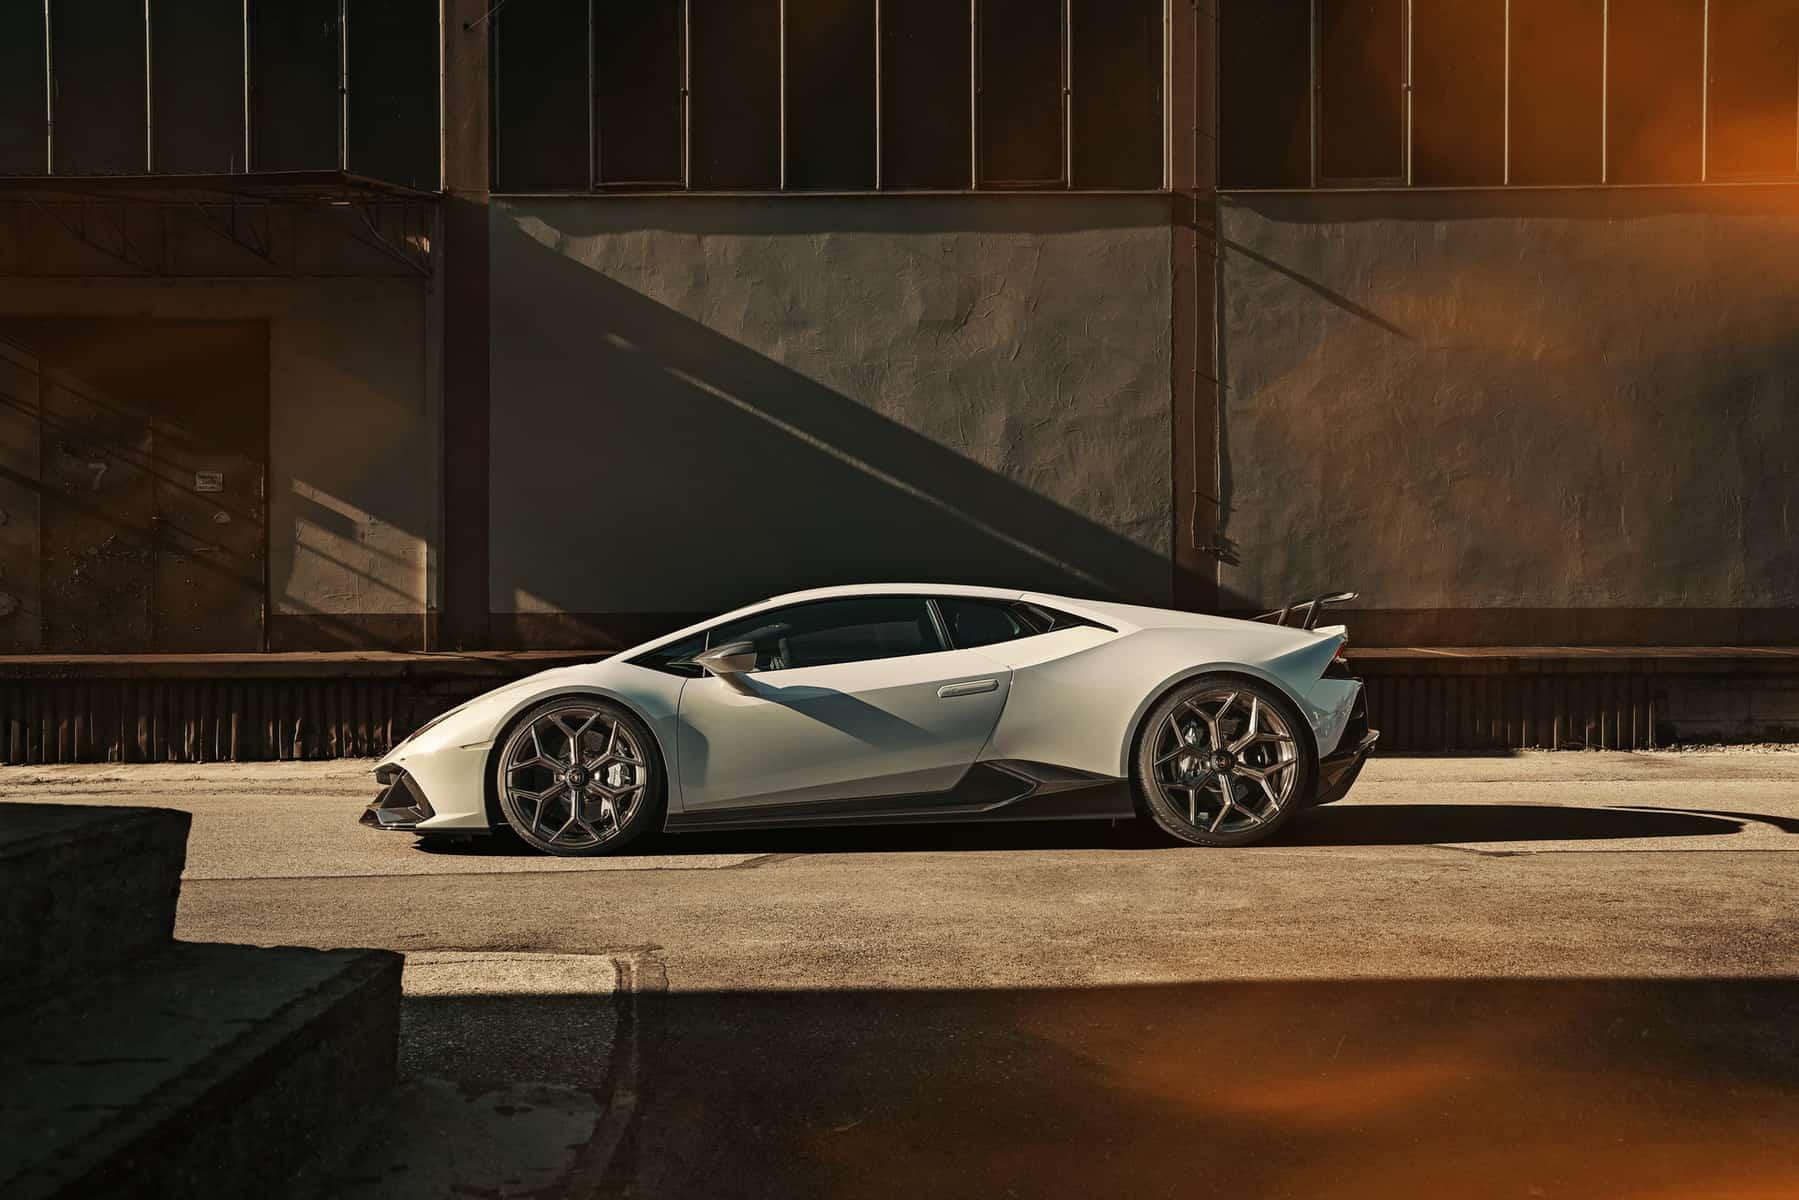 Novitec's Lamborghini Huracan Evo is Simply Irresistible!